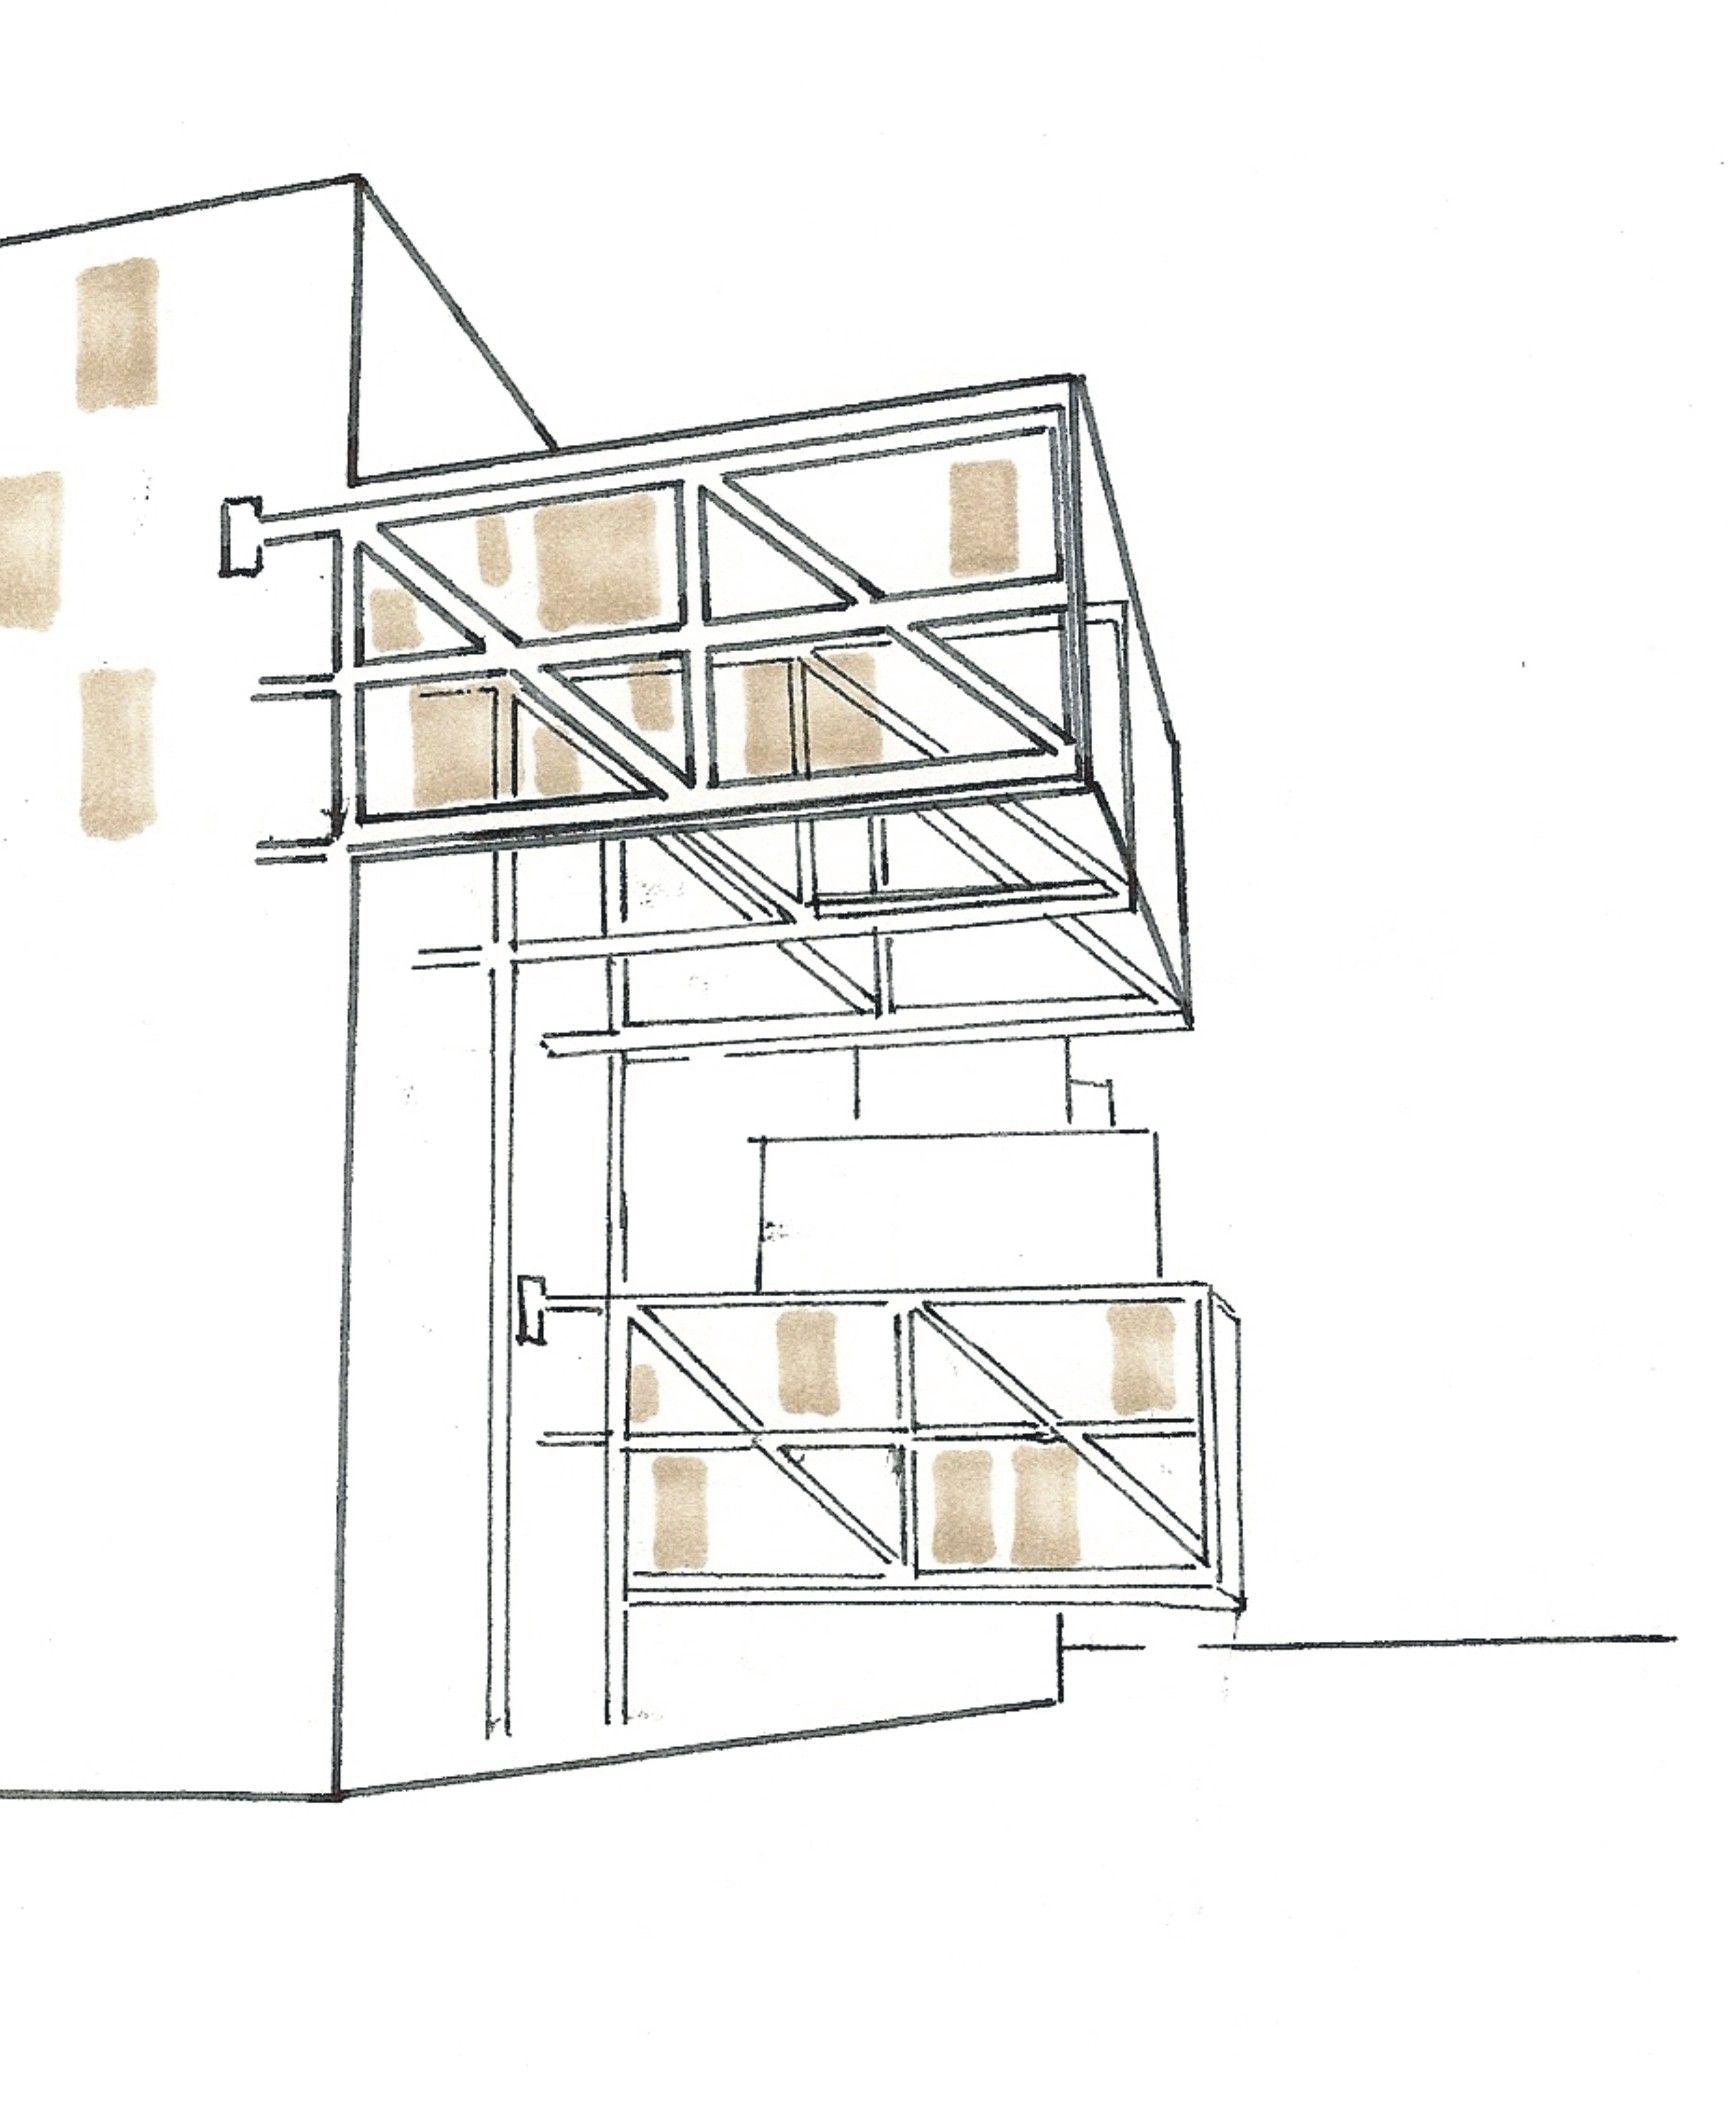 Risultati Immagini Per Wozoco Apartments Mvrdv Detail